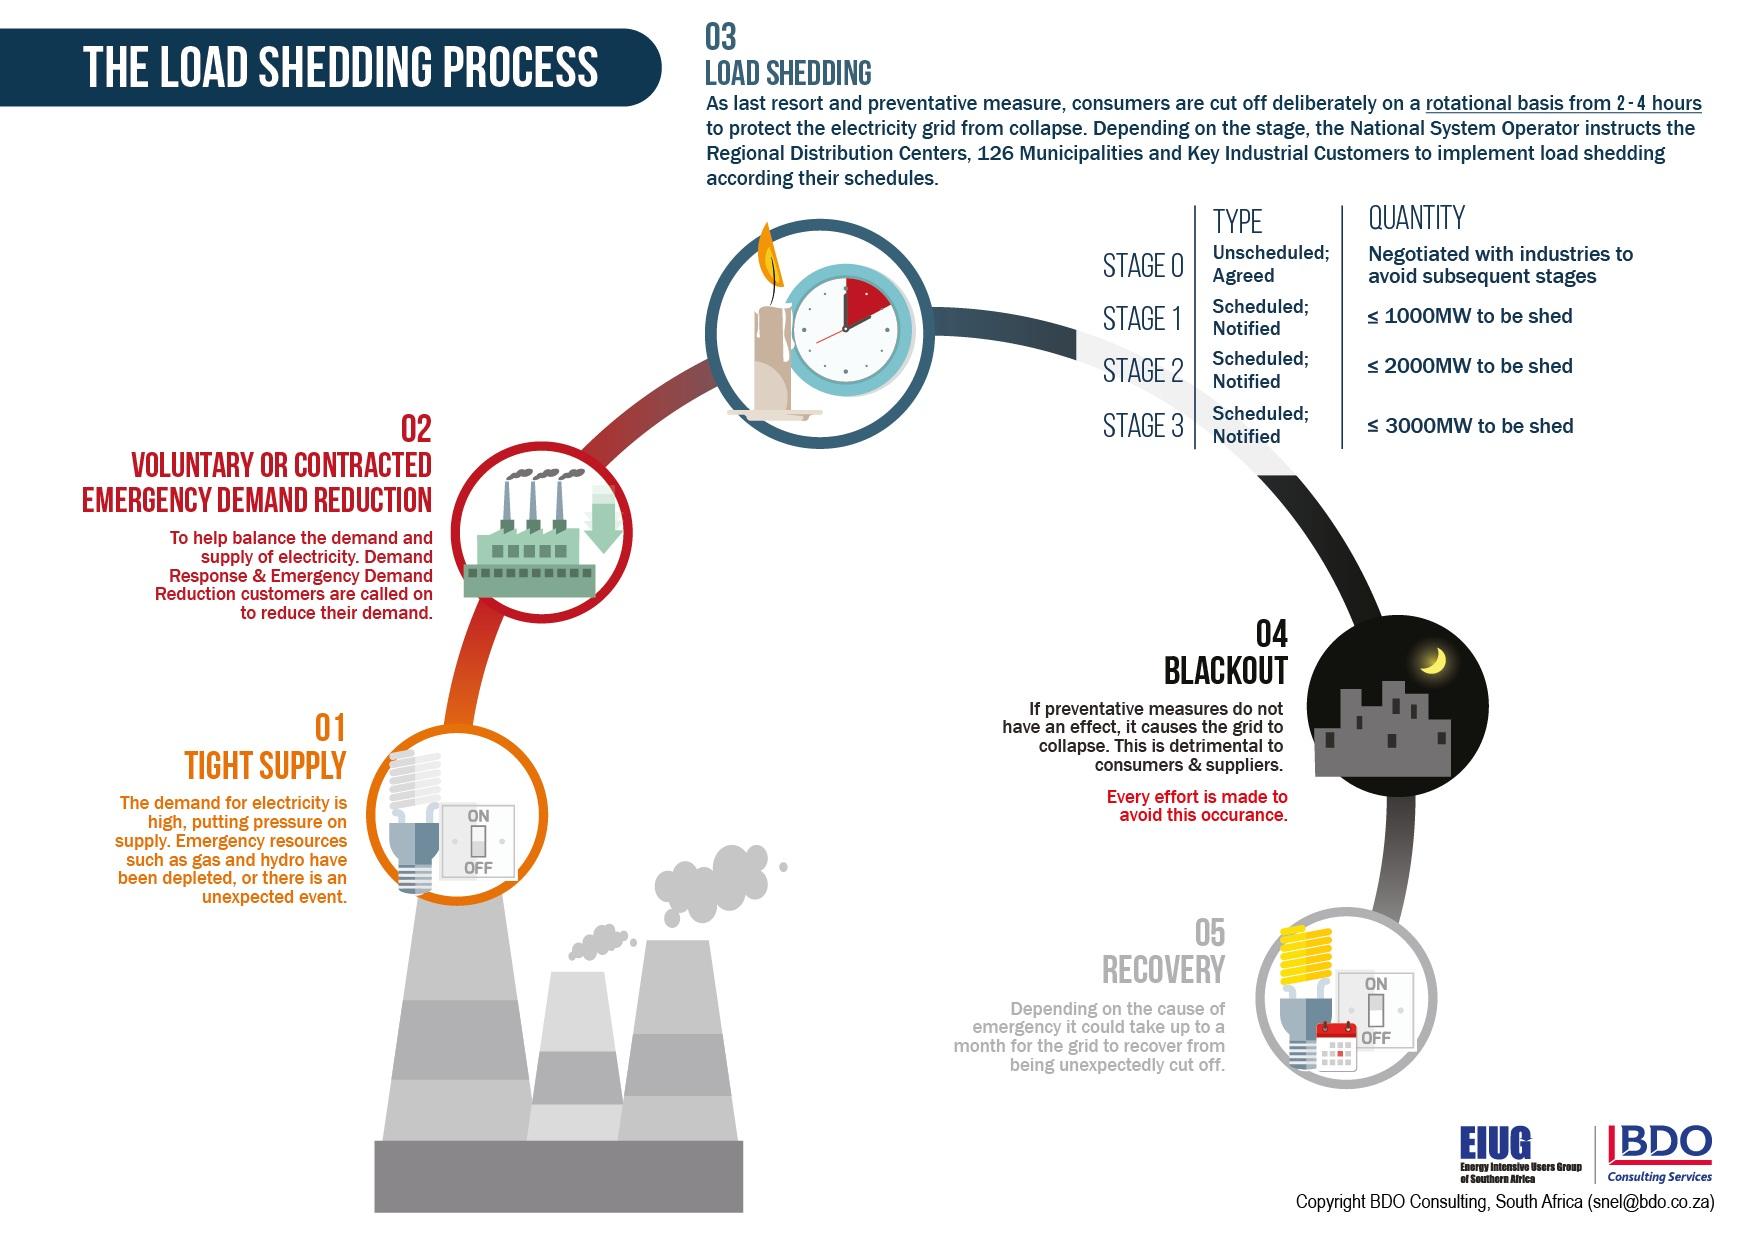 Infographic: Load-shedding Explained